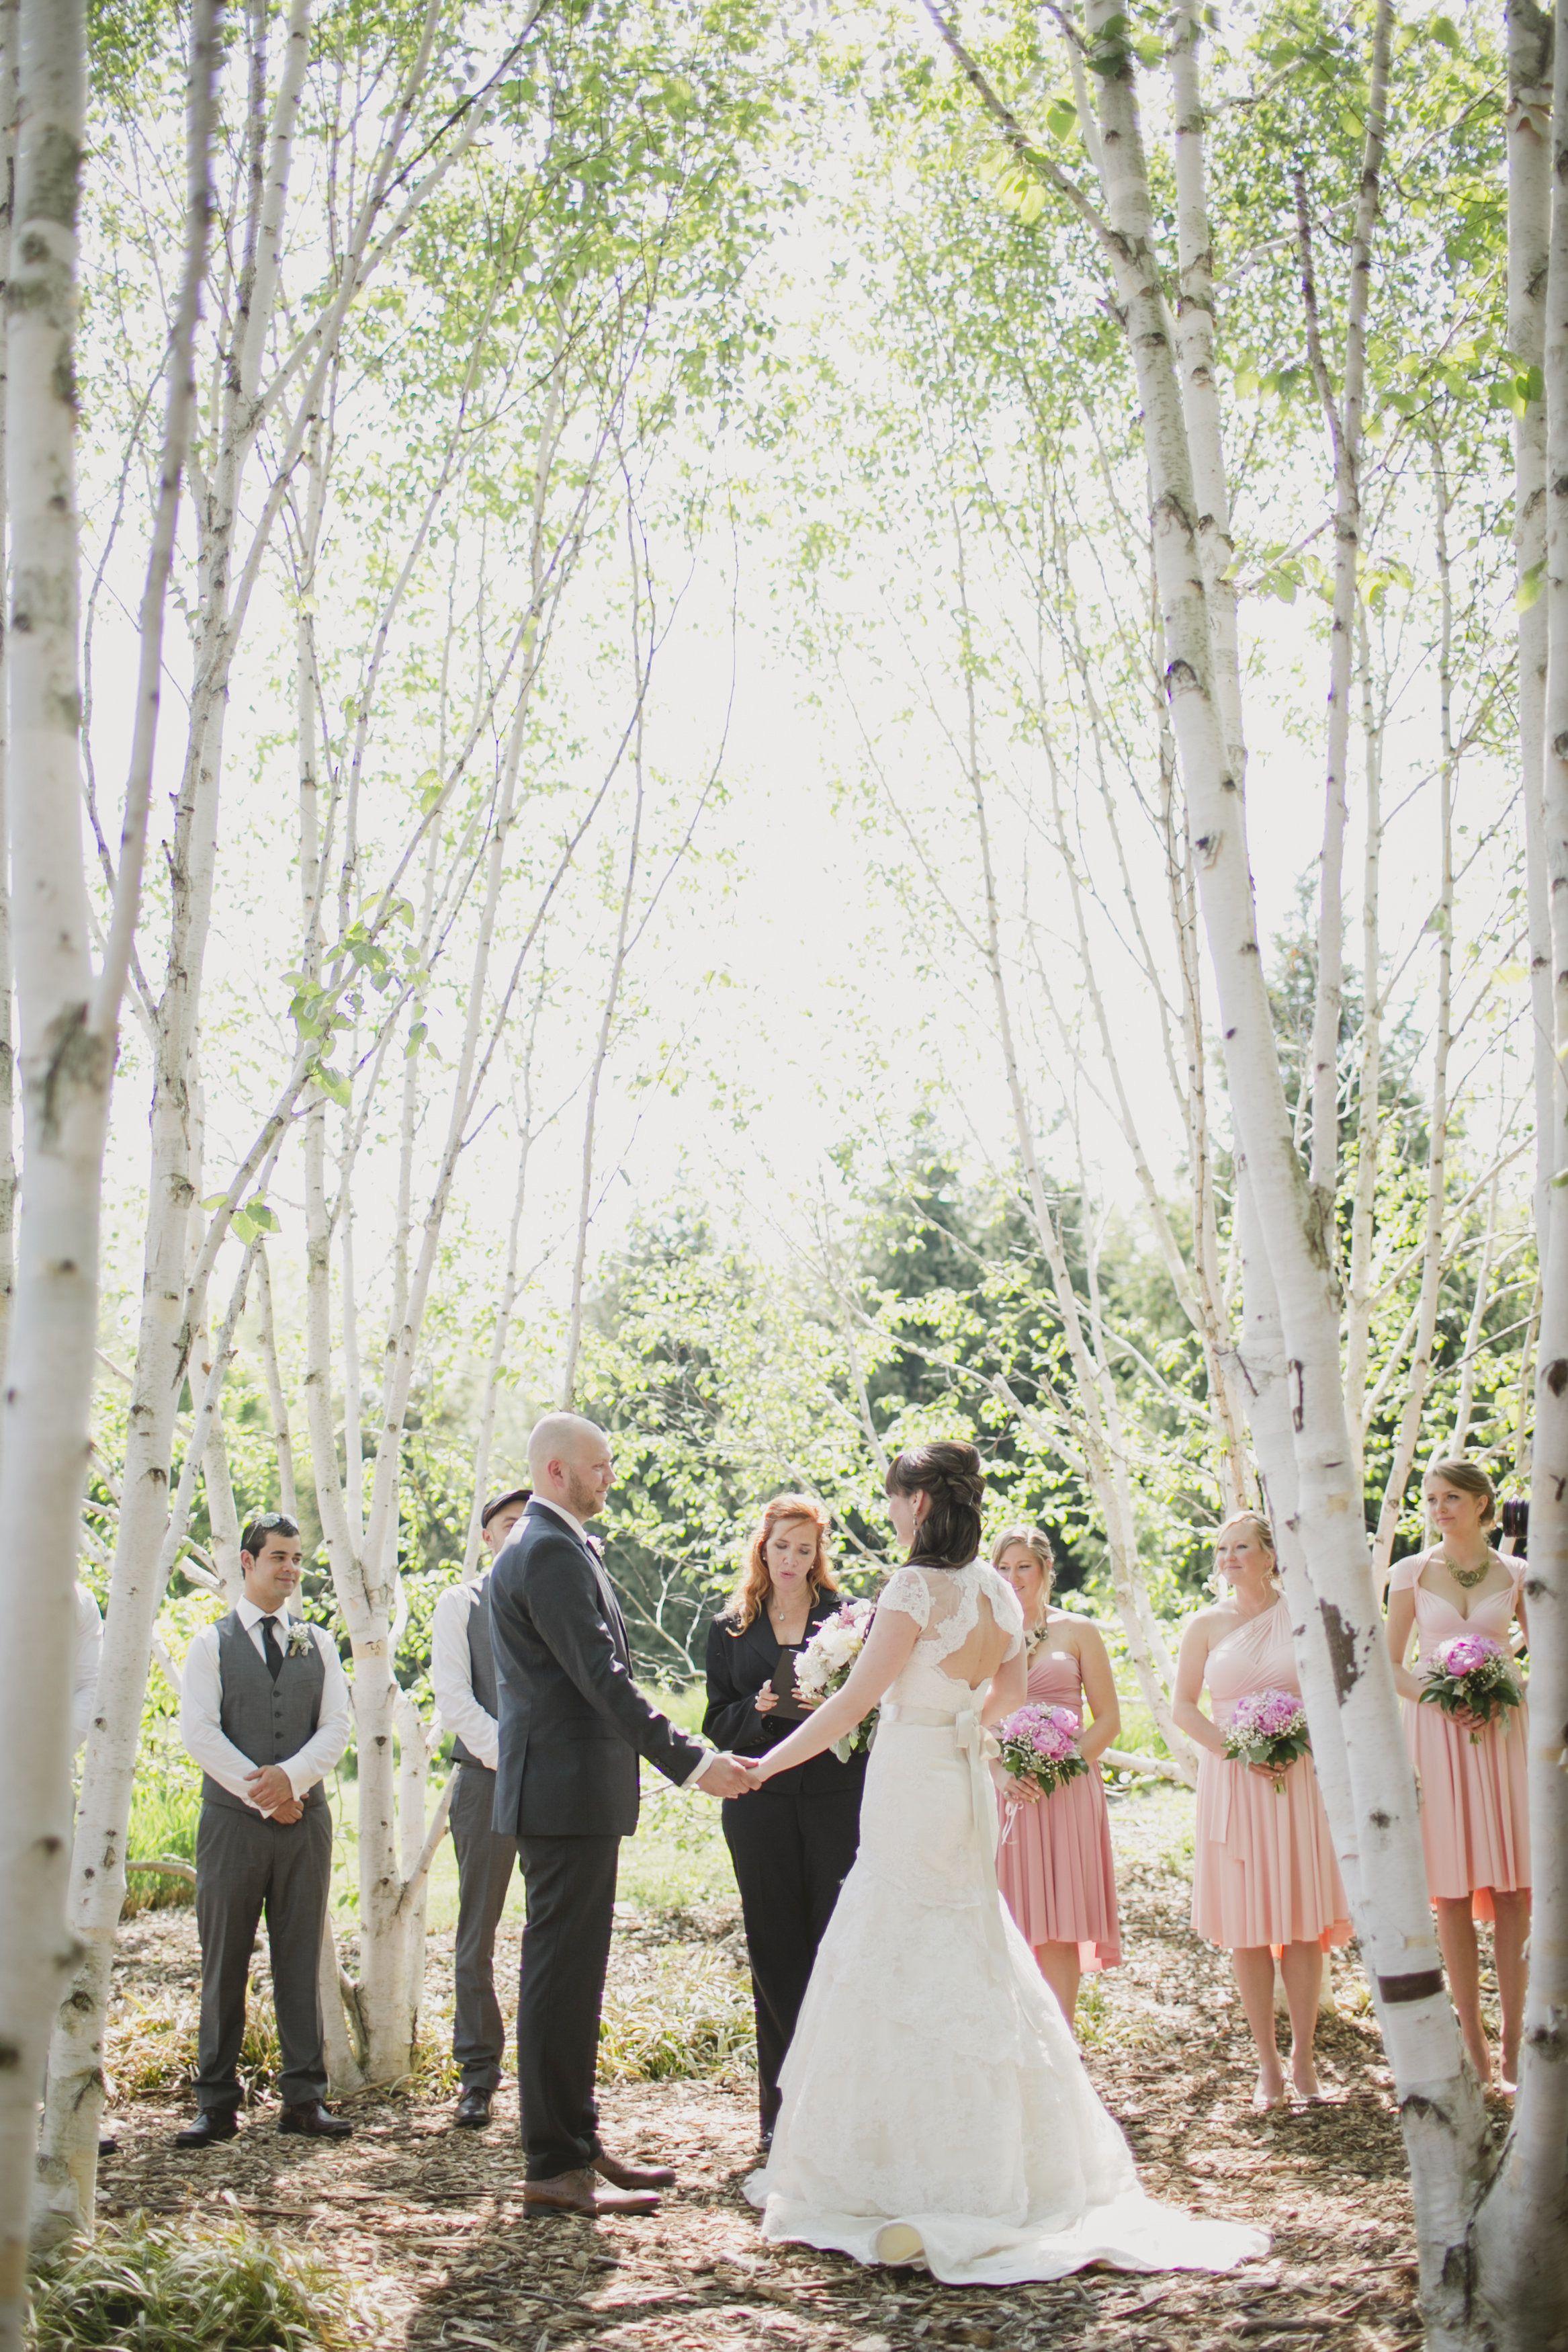 Gallery Inspiration Picture 1302947 Niagara Falls Wedding Outdoor Fall Wedding Fall Wedding Venues